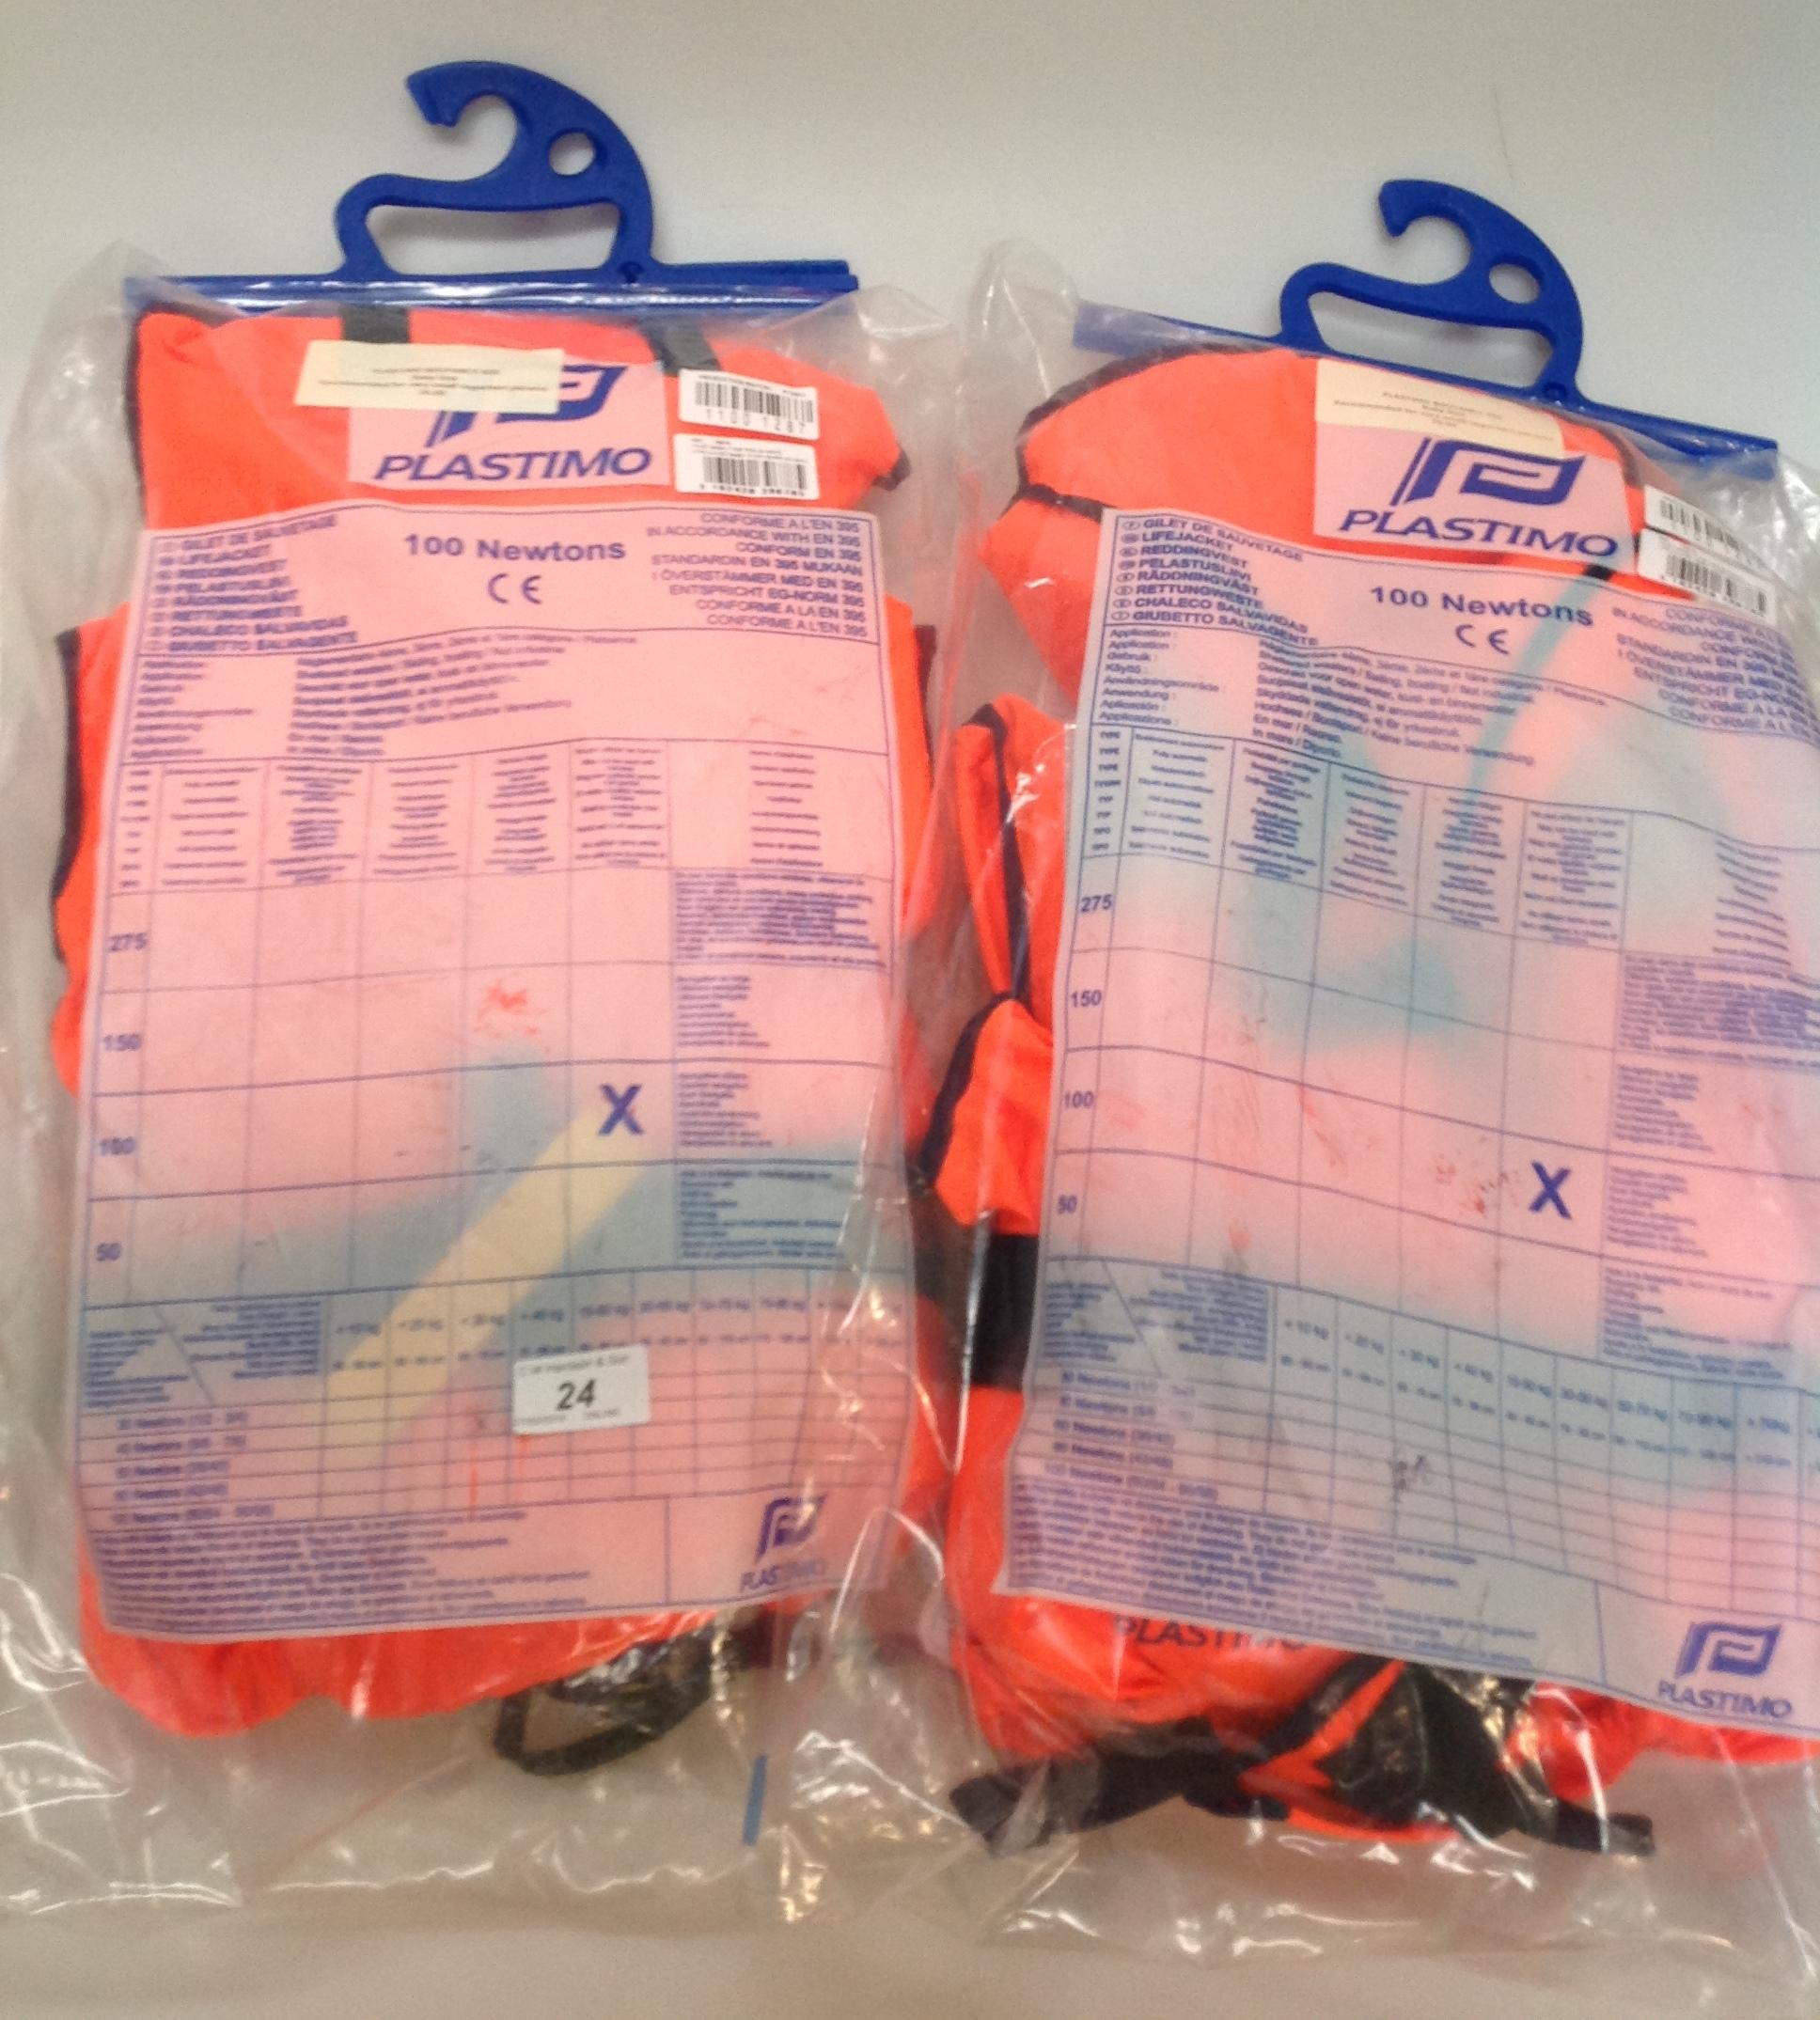 Lot 24 - 2 x Plastimo baby 100 Newtons buoyancy aids - (RRP £36)